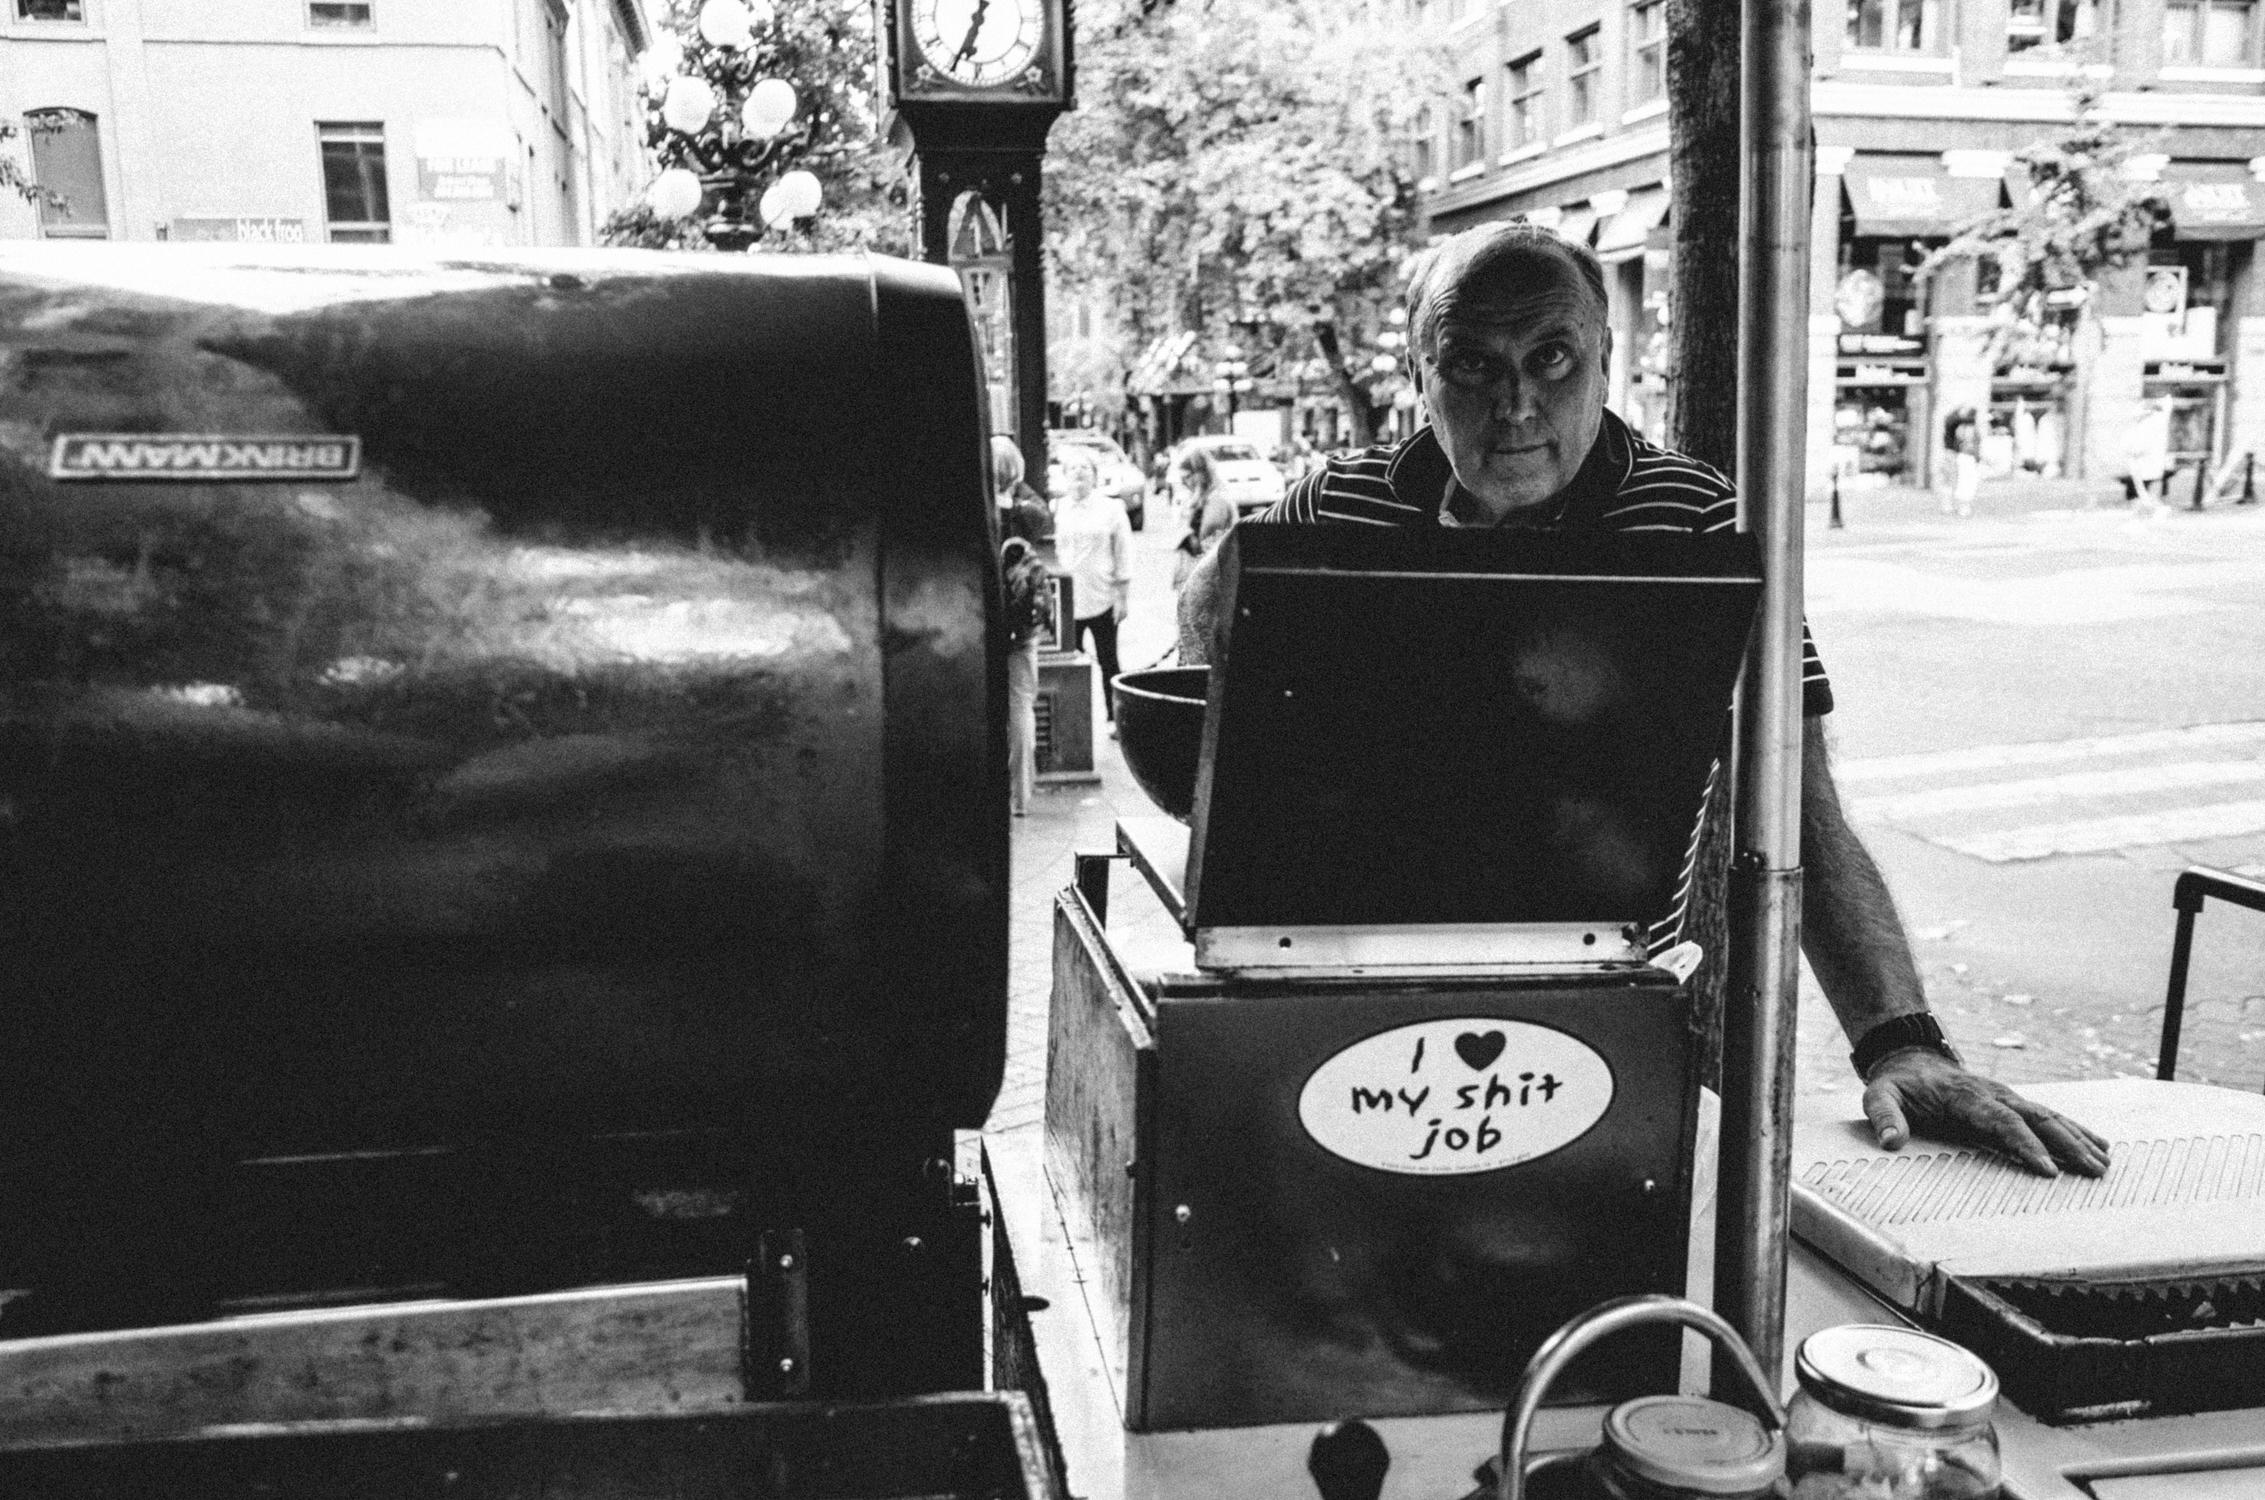 love shit job - urban, streetphotography - boenau | ello